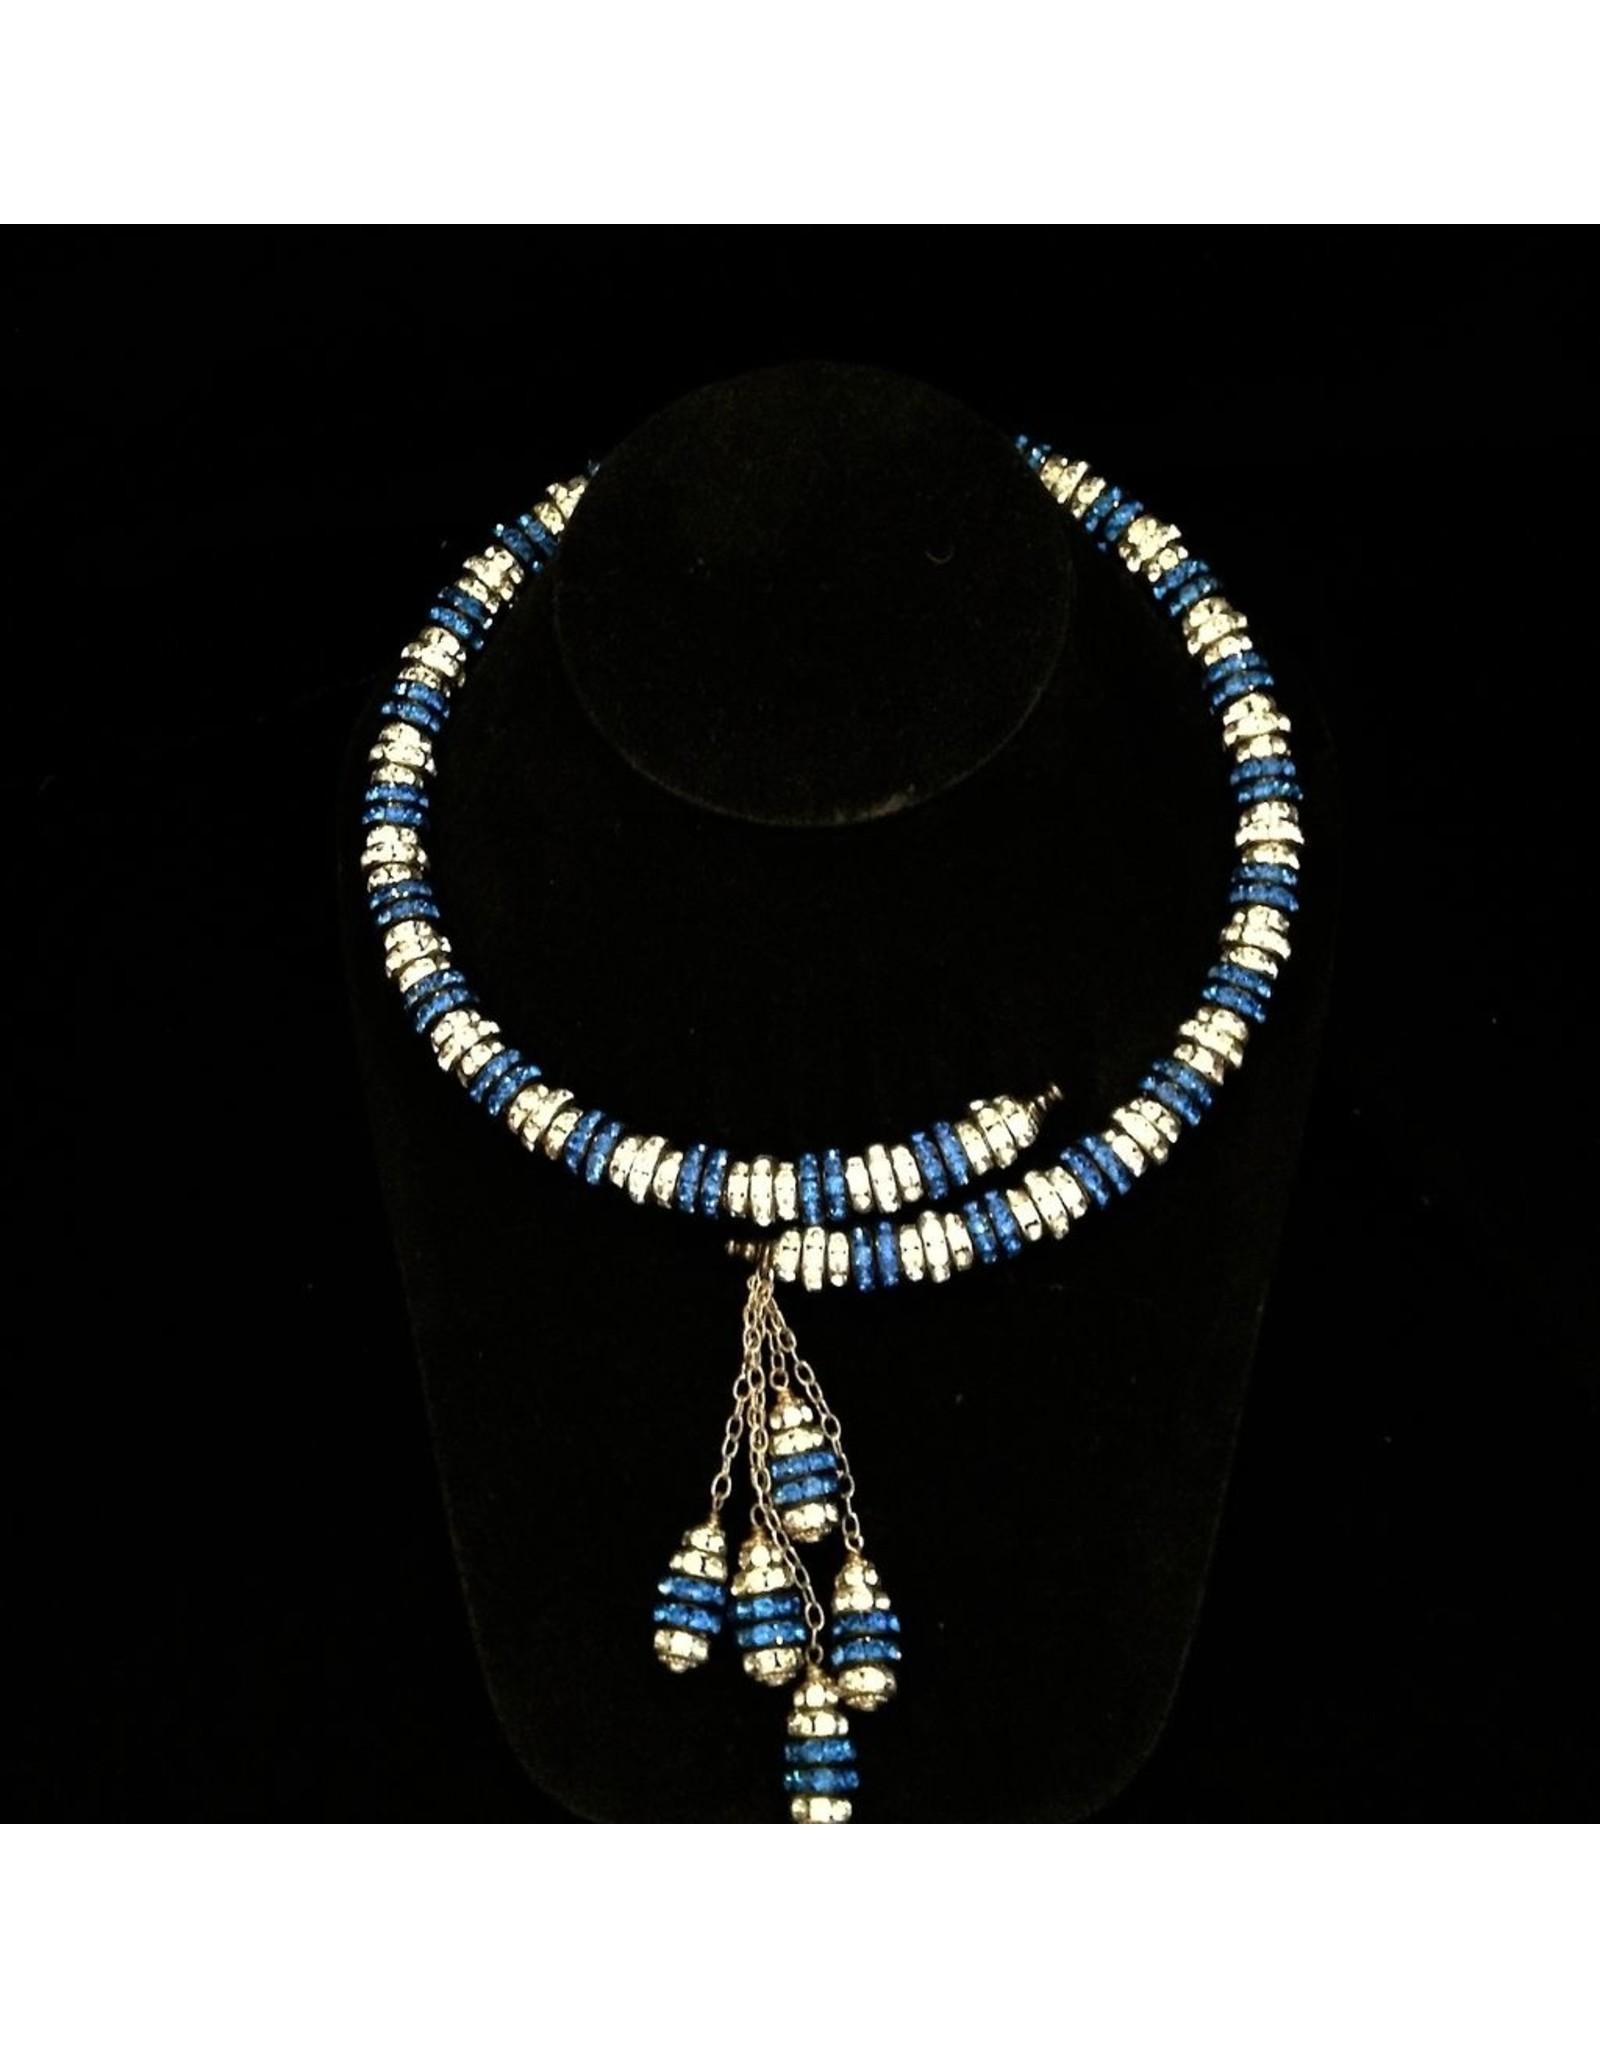 Francoise Montague Yasmin Wrap in Cobalt & Silver